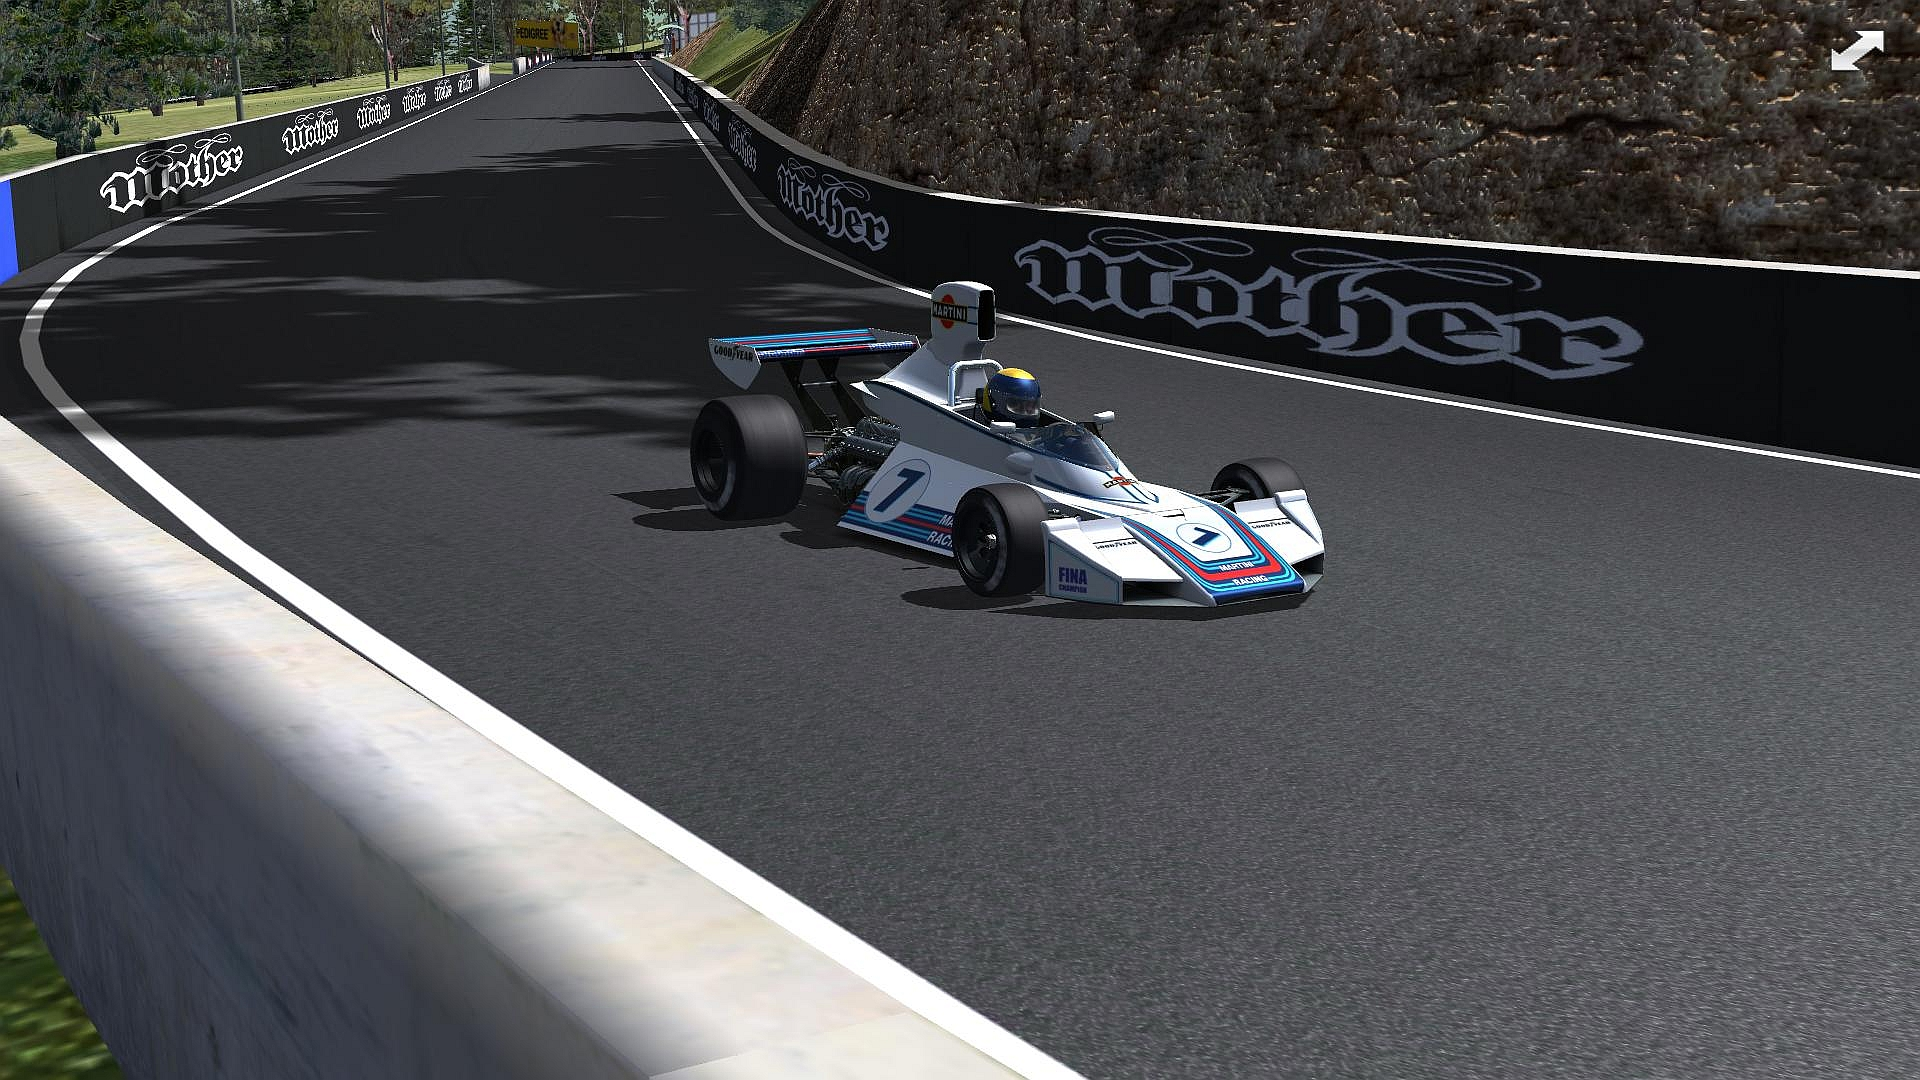 F1 Retro